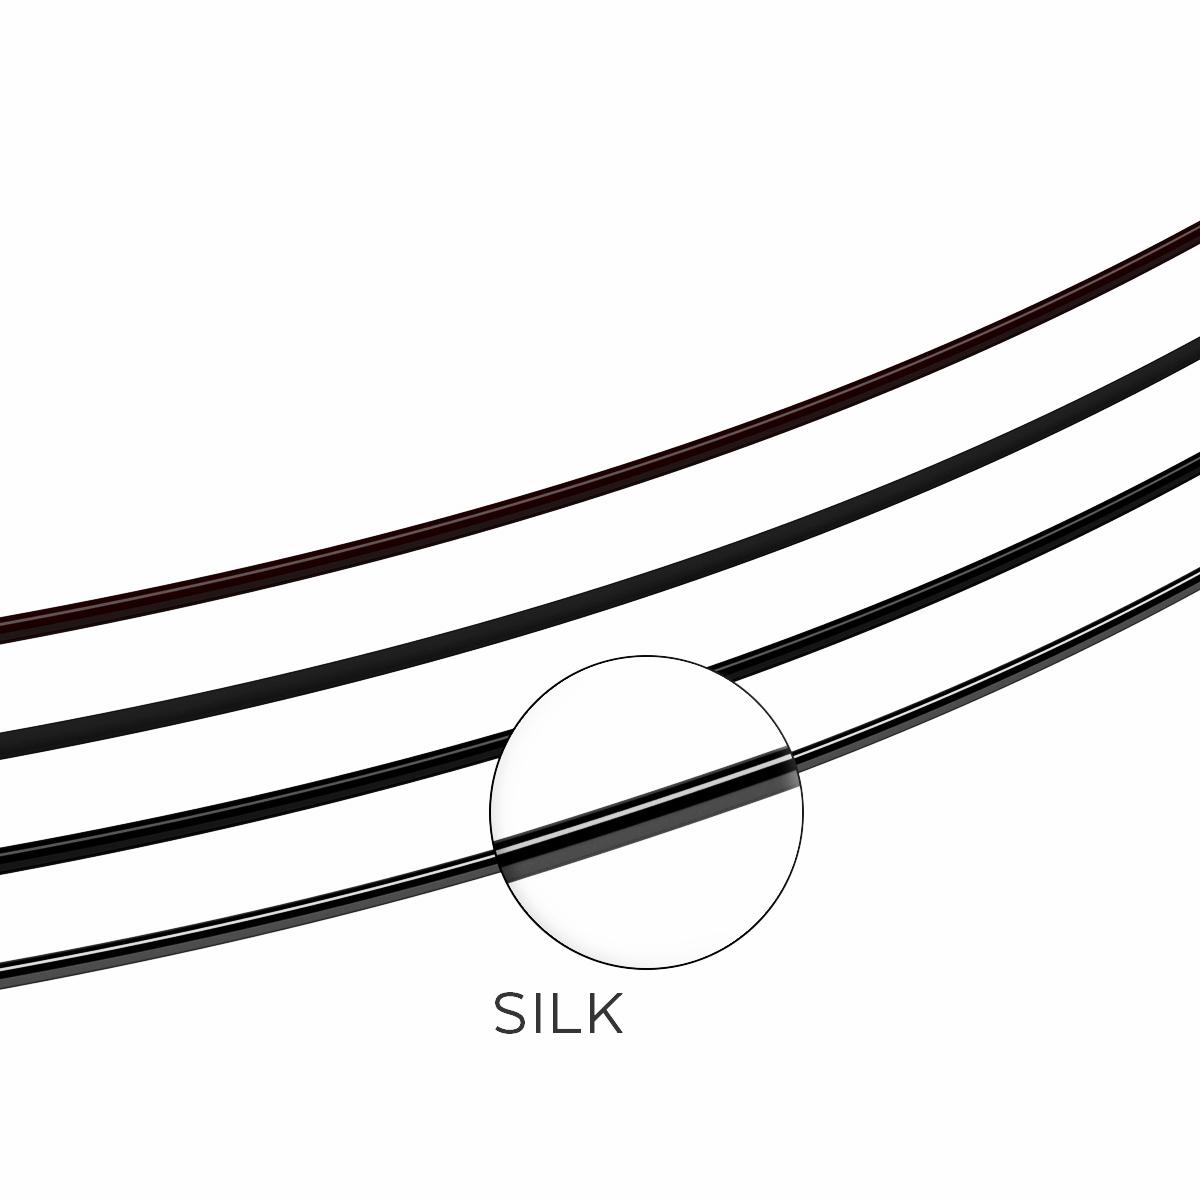 silk-black-c-0-2